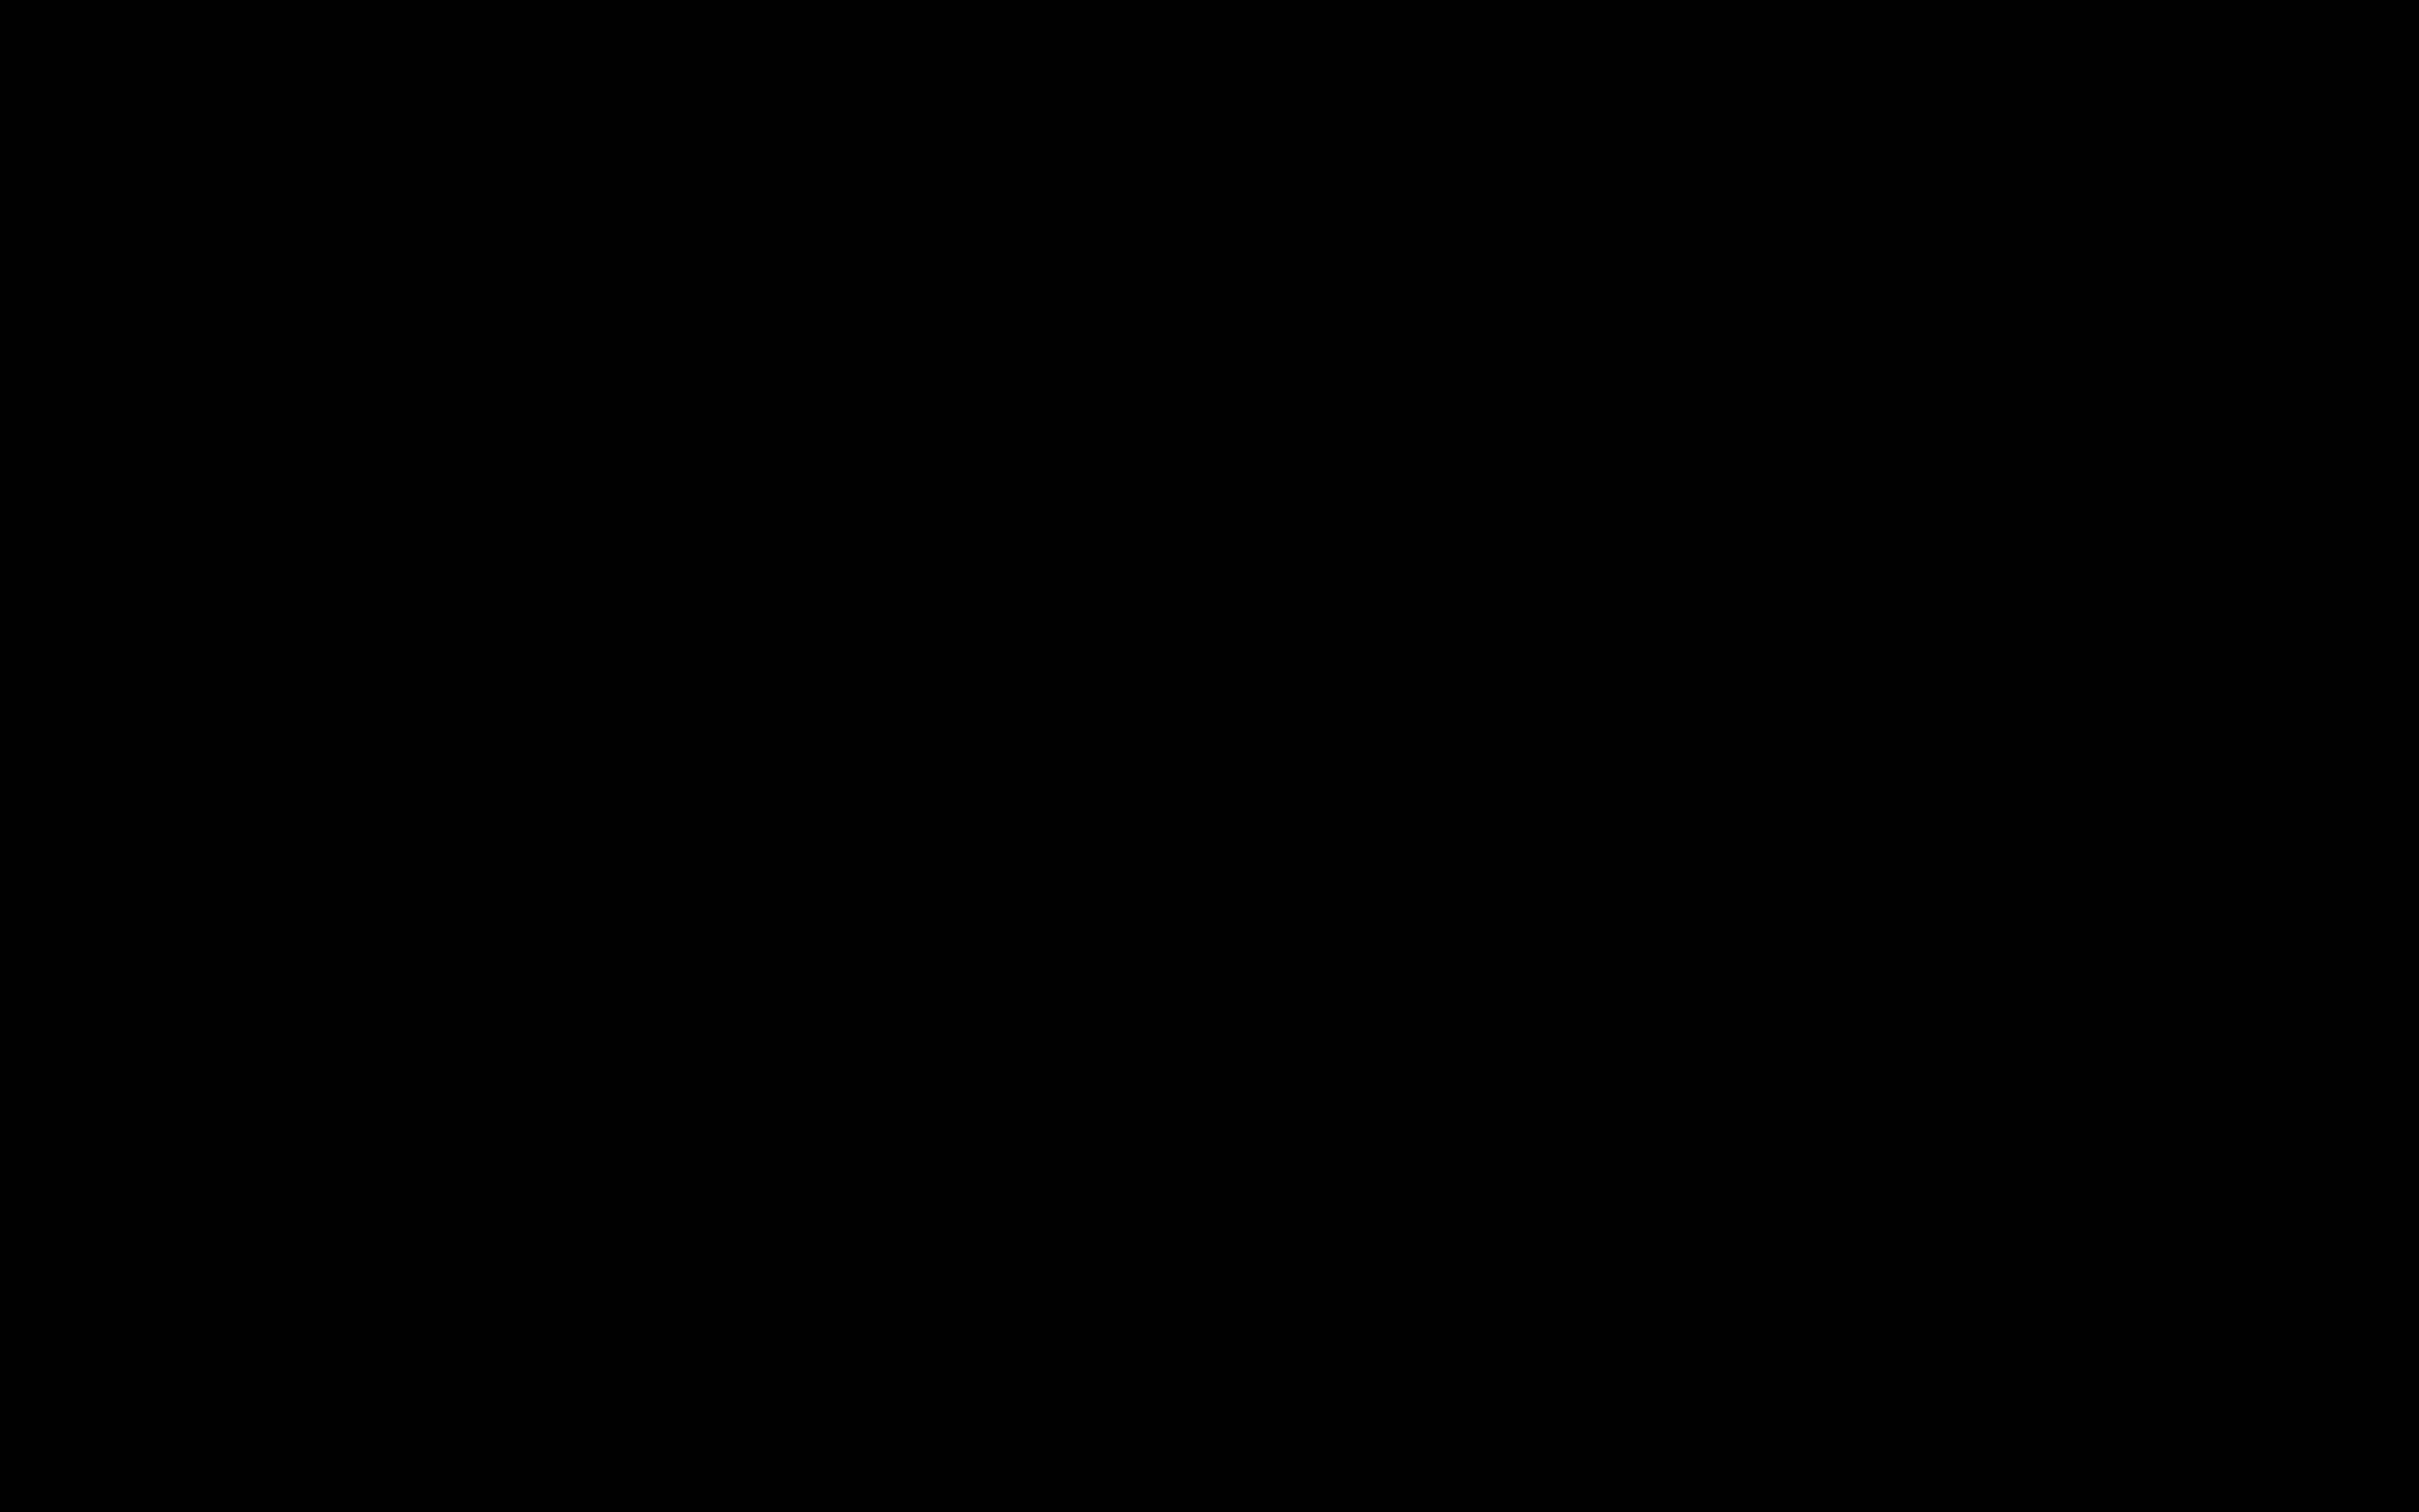 ARDEX-white-pebble-logo.png